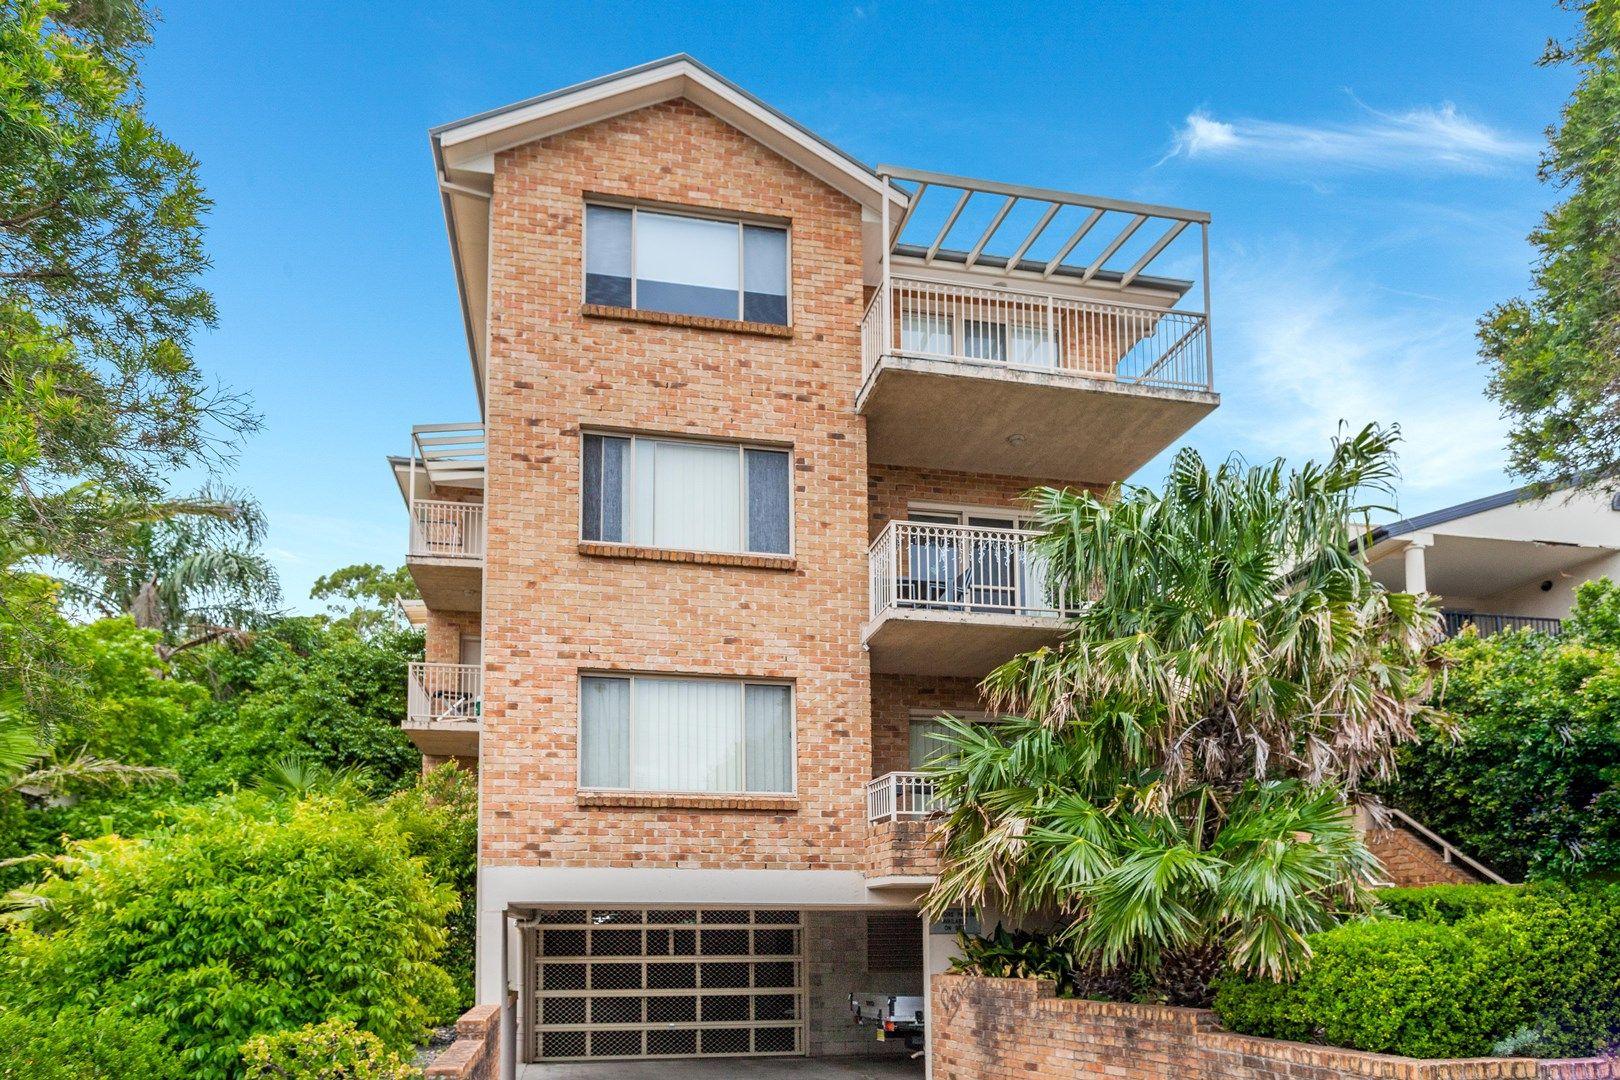 6/25 Mercury Street, Wollongong NSW 2500, Image 0